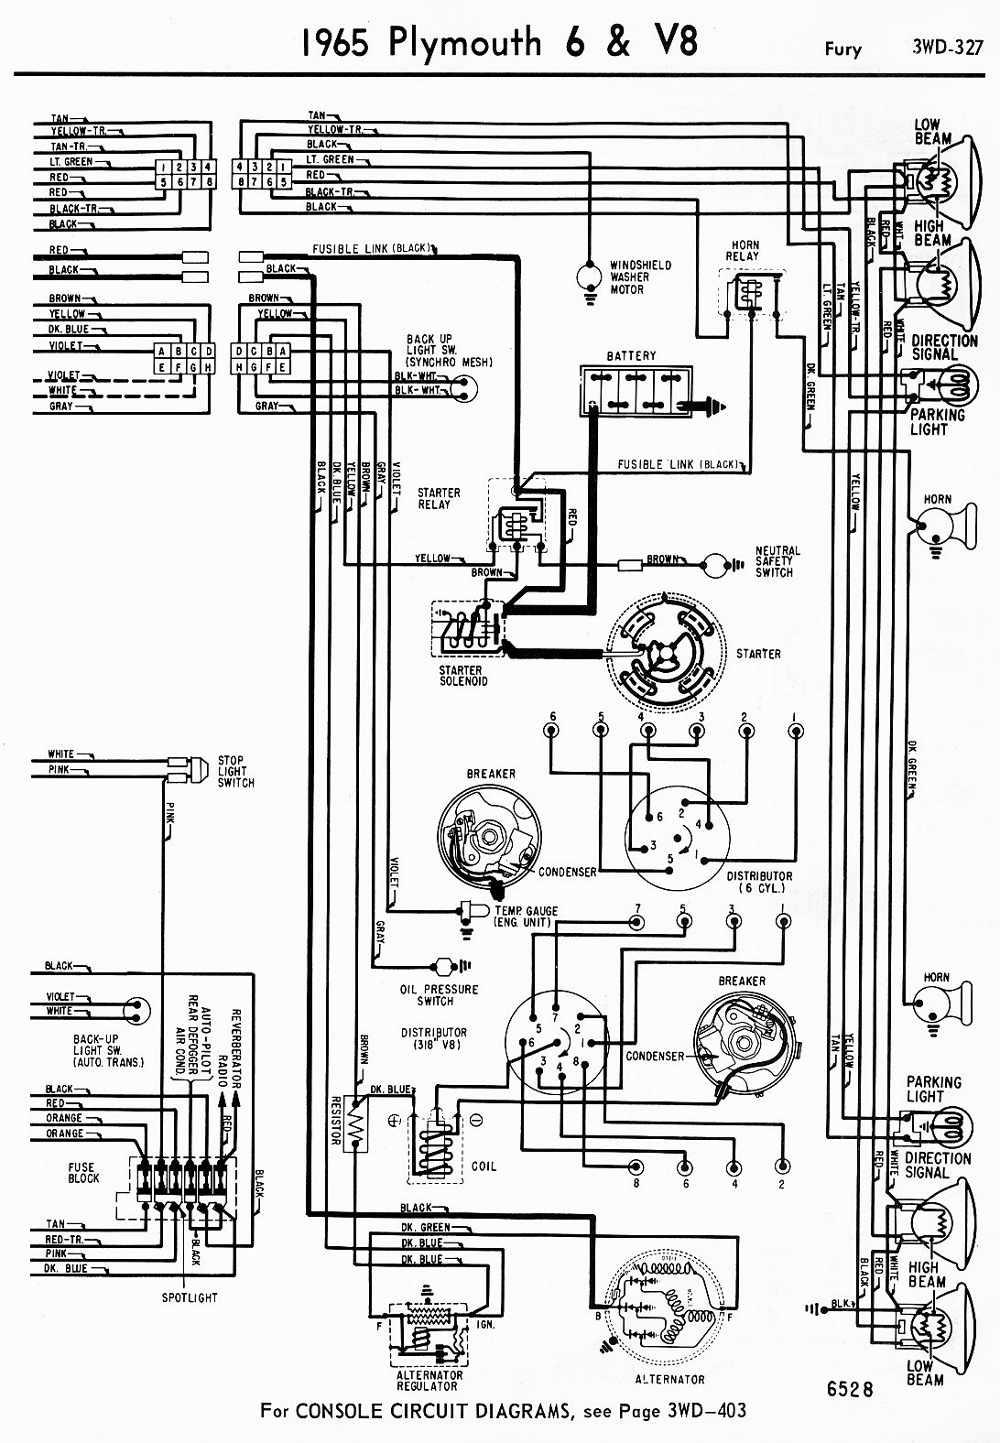 hight resolution of 1966 plymouth wiring diagram wiring schematic 1971 nova door parts diagram 1967 plymouth wiring diagram wiring